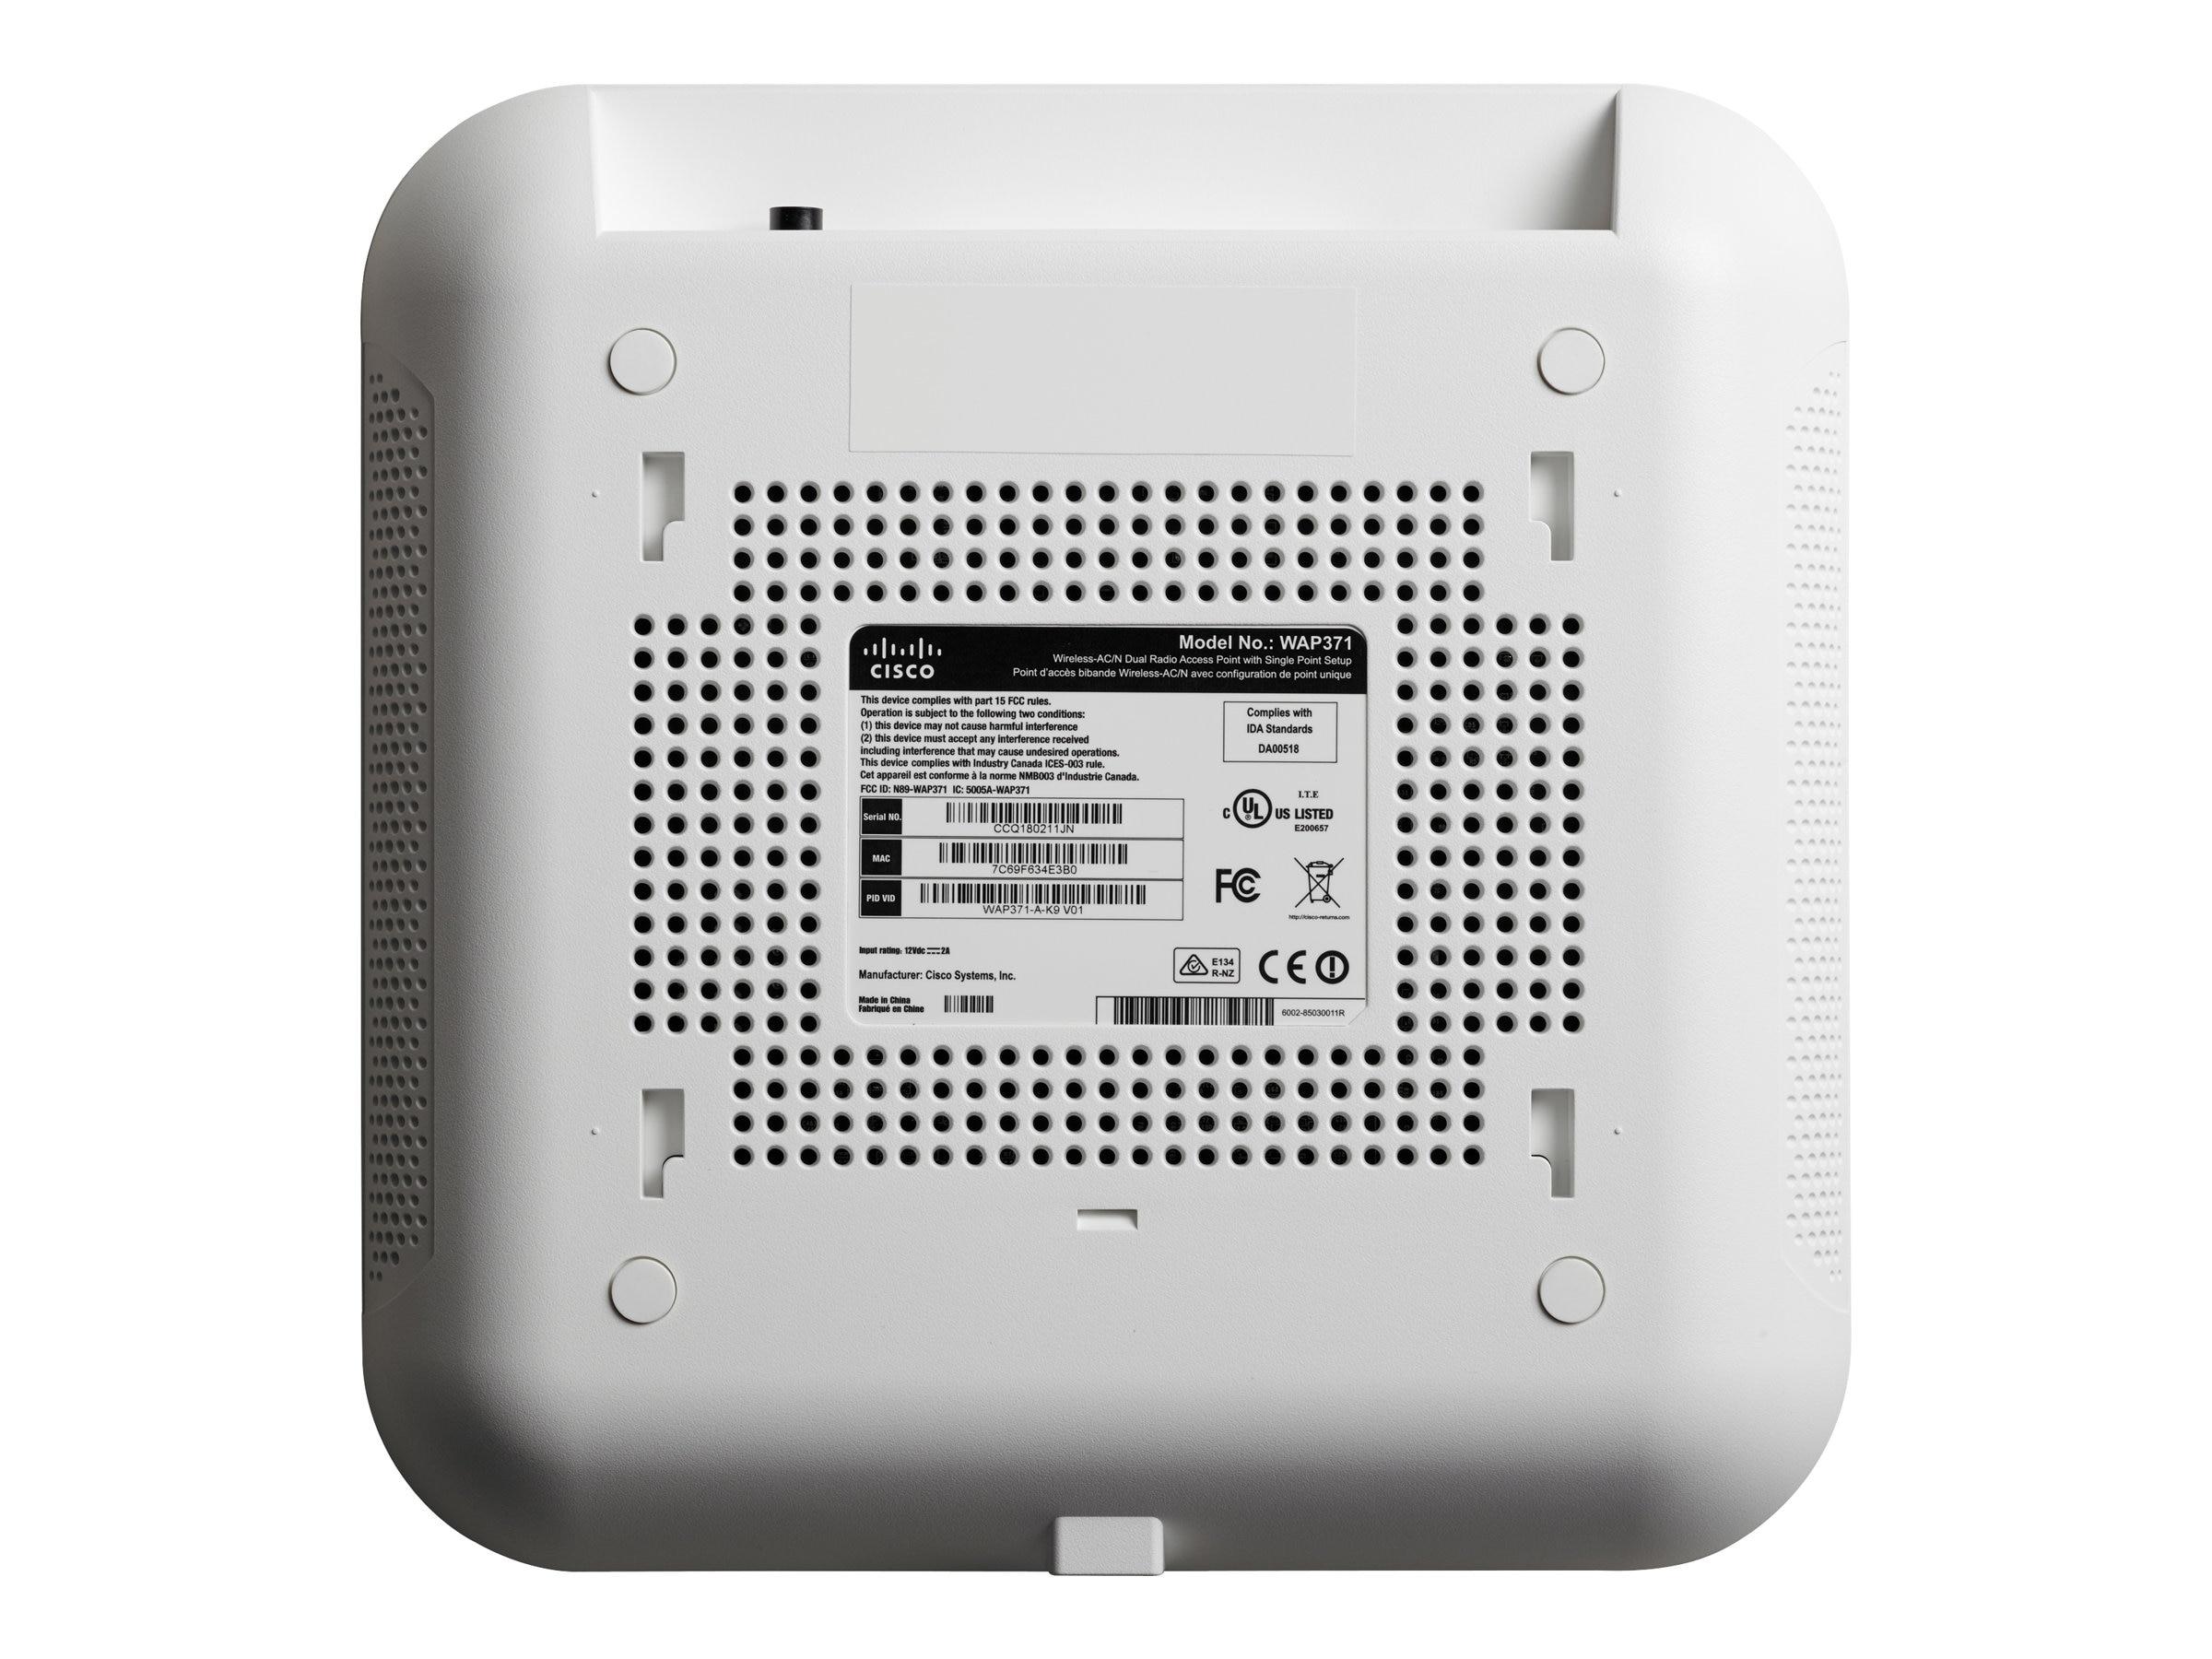 Cisco WAP371-A-K9 Image 4